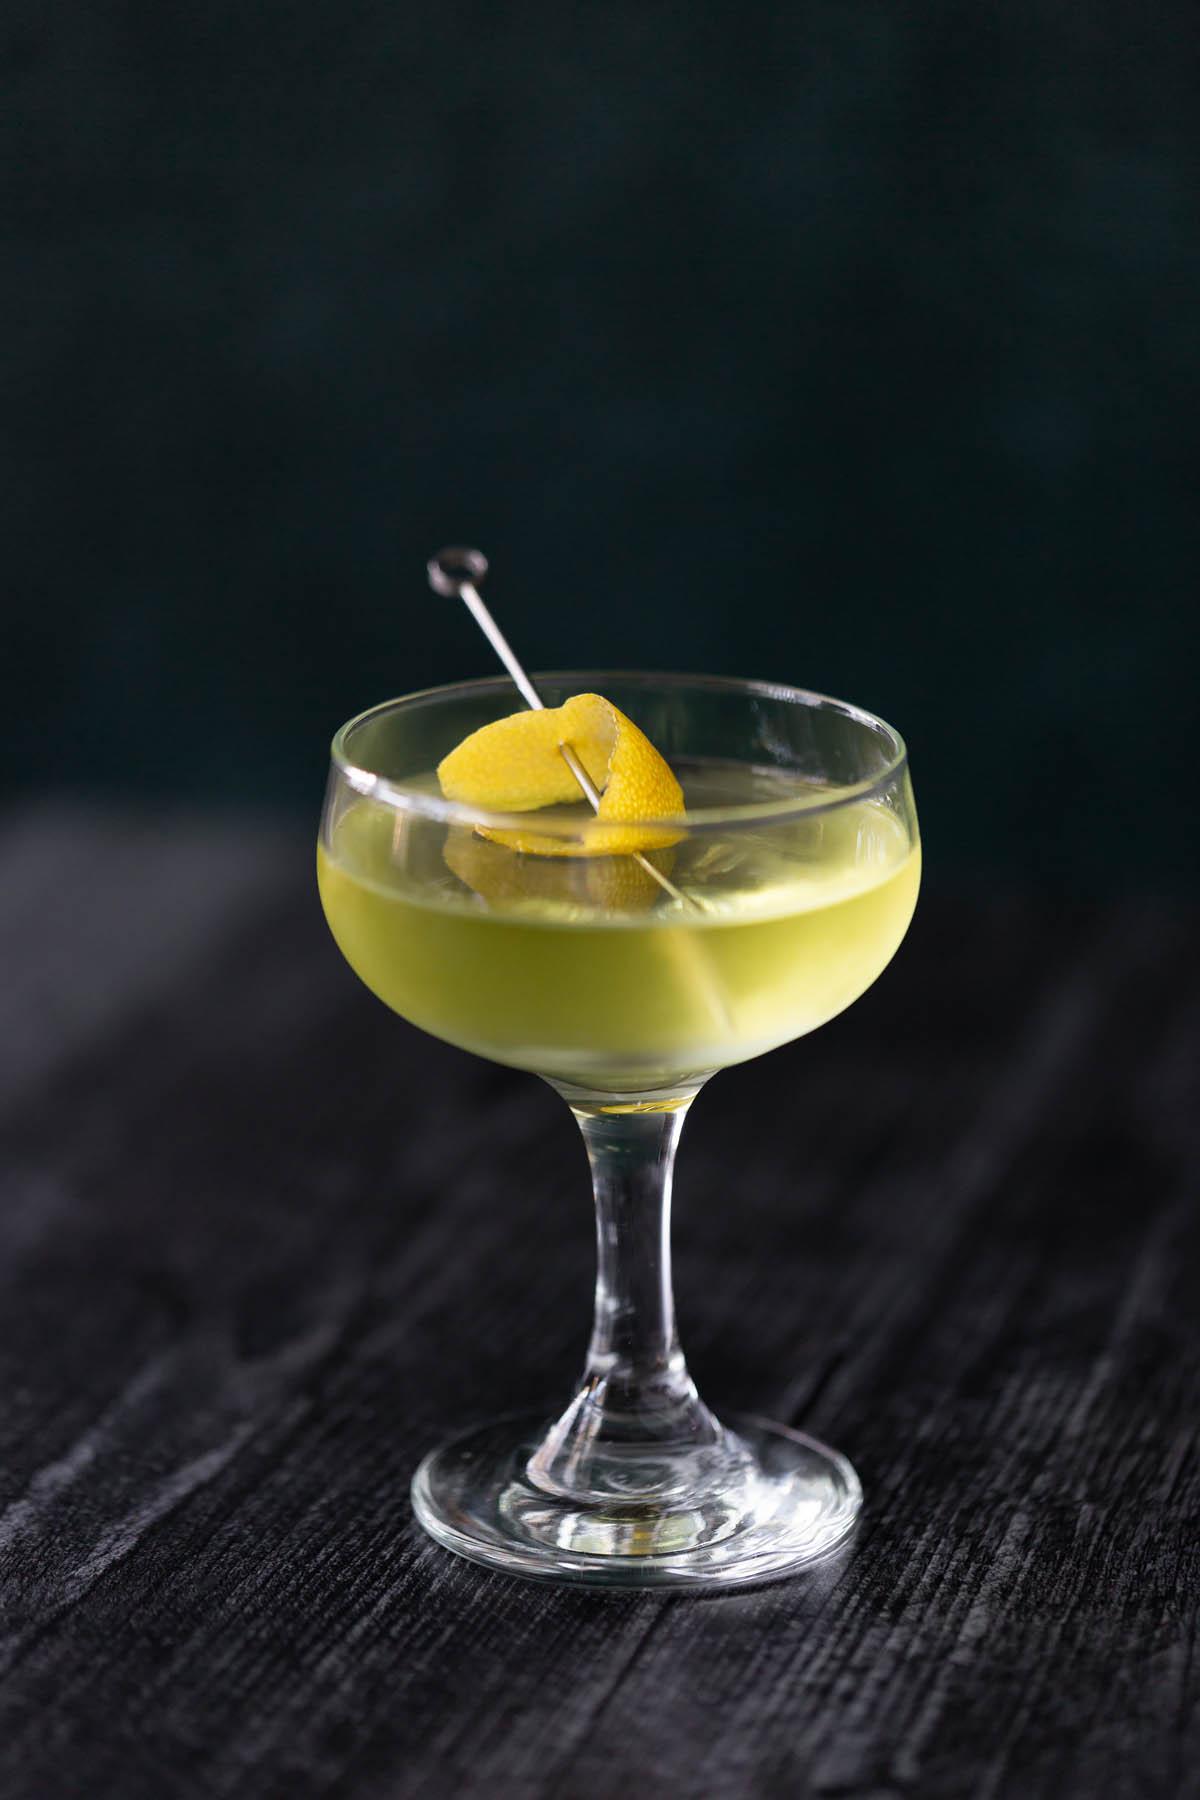 alaska cocktail with lemon zest